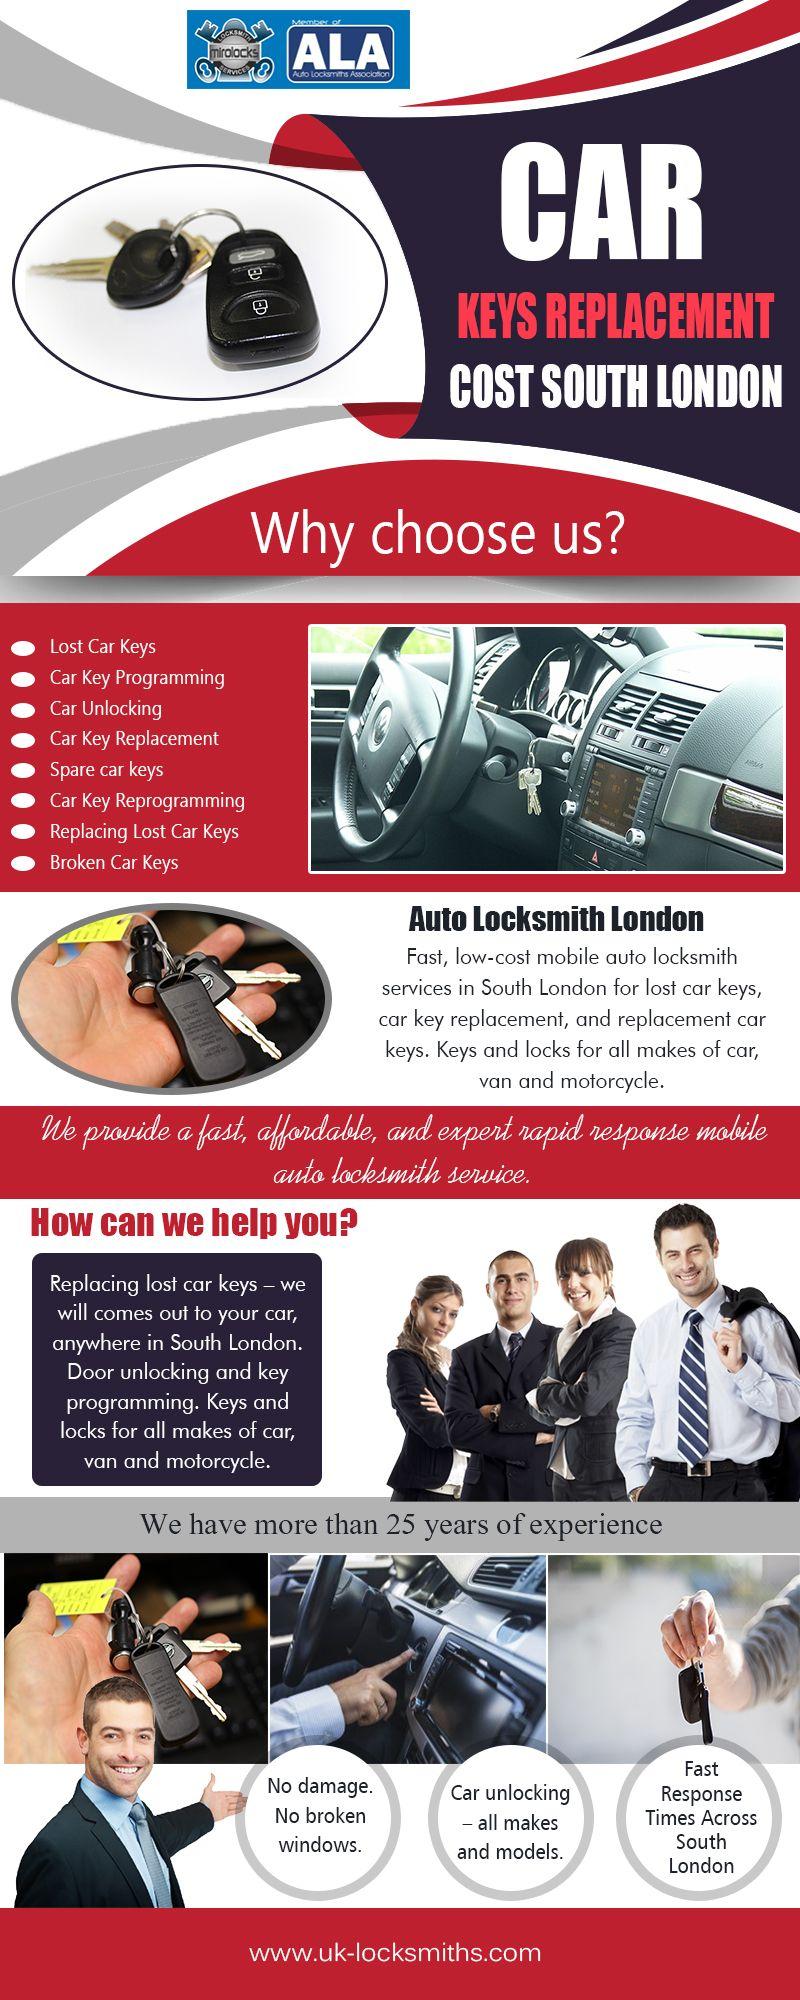 Car Keys Replacement Cost South London Call 07462 327 027 Uk Locksmiths Com Car Key Replacement Key Replacement Car Key Programming